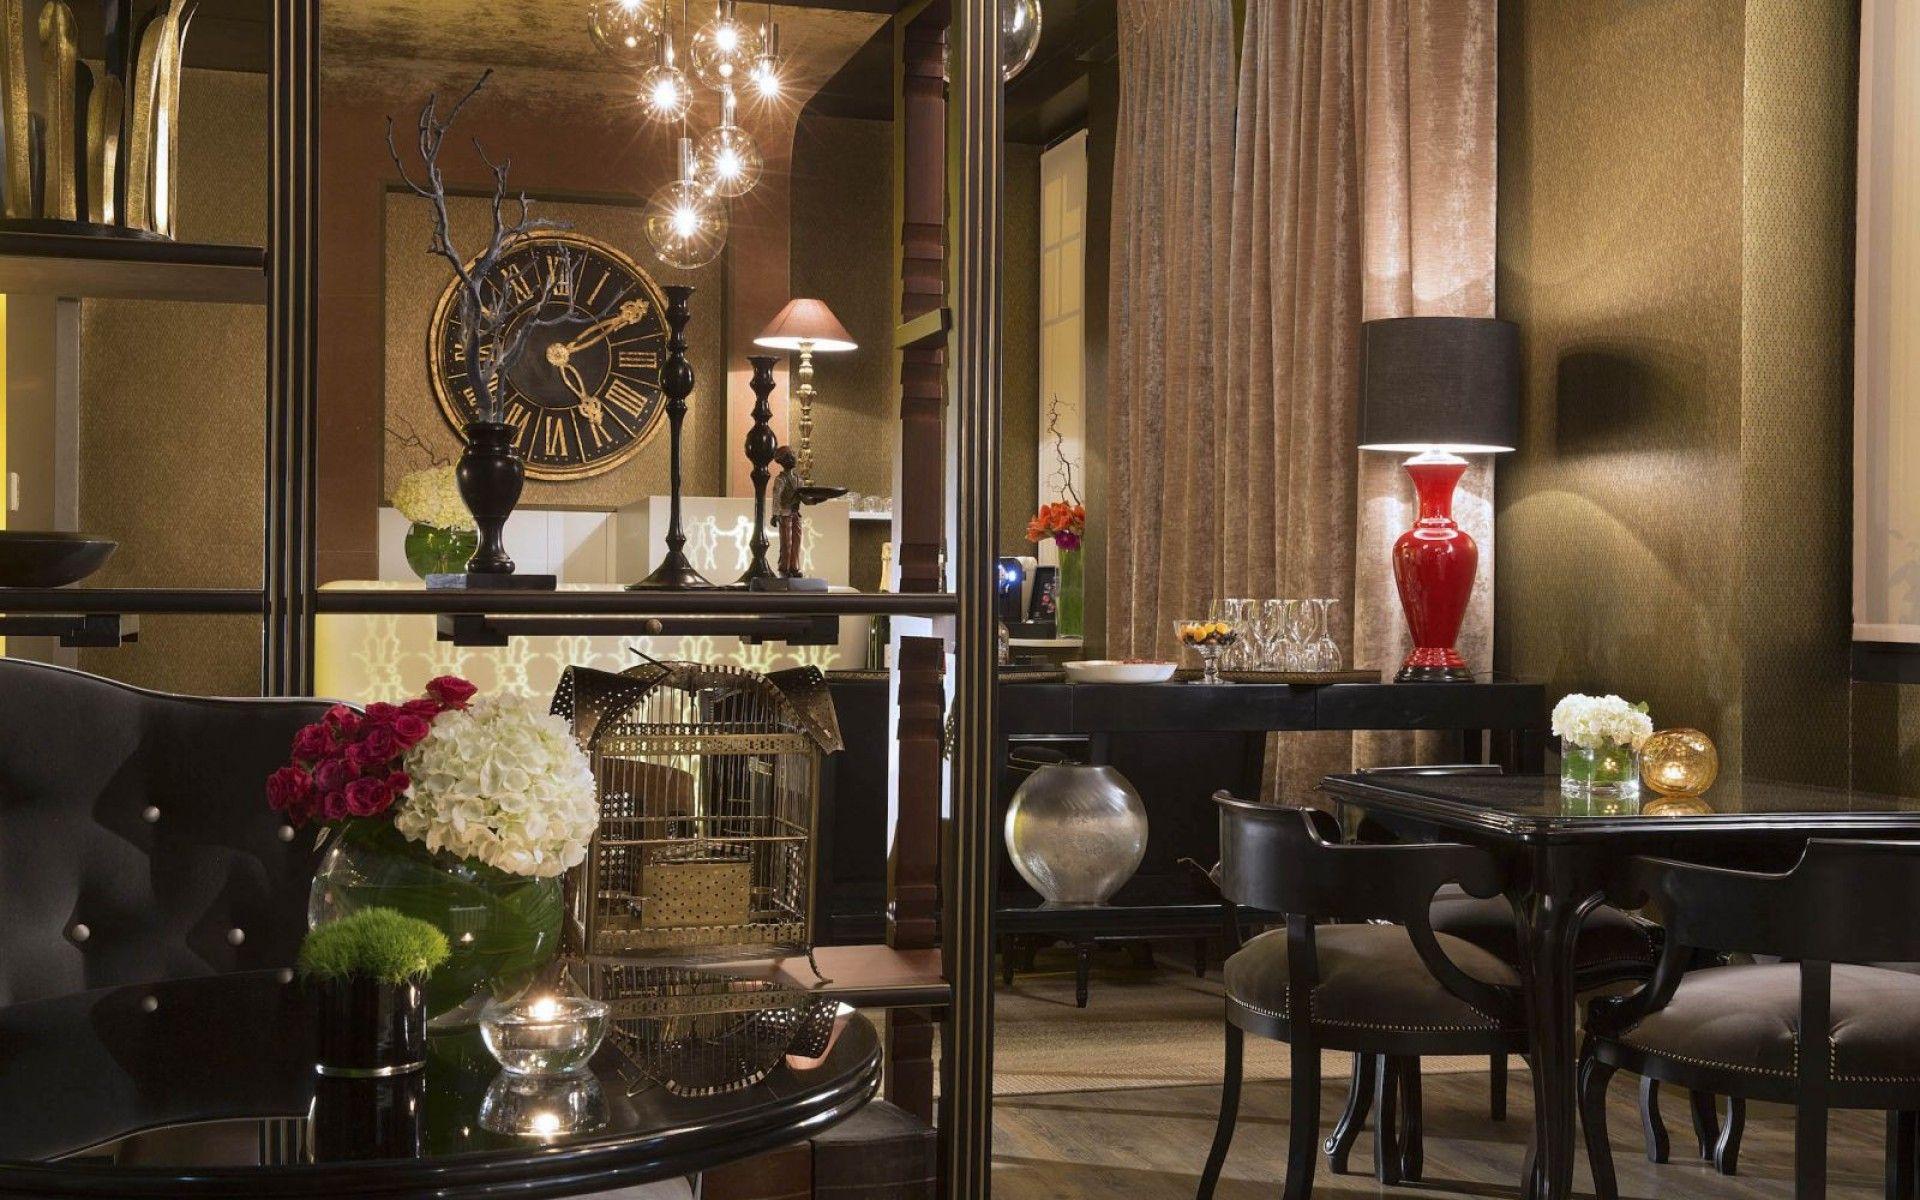 photos hotel gabriel hotel paris republique hotel. Black Bedroom Furniture Sets. Home Design Ideas